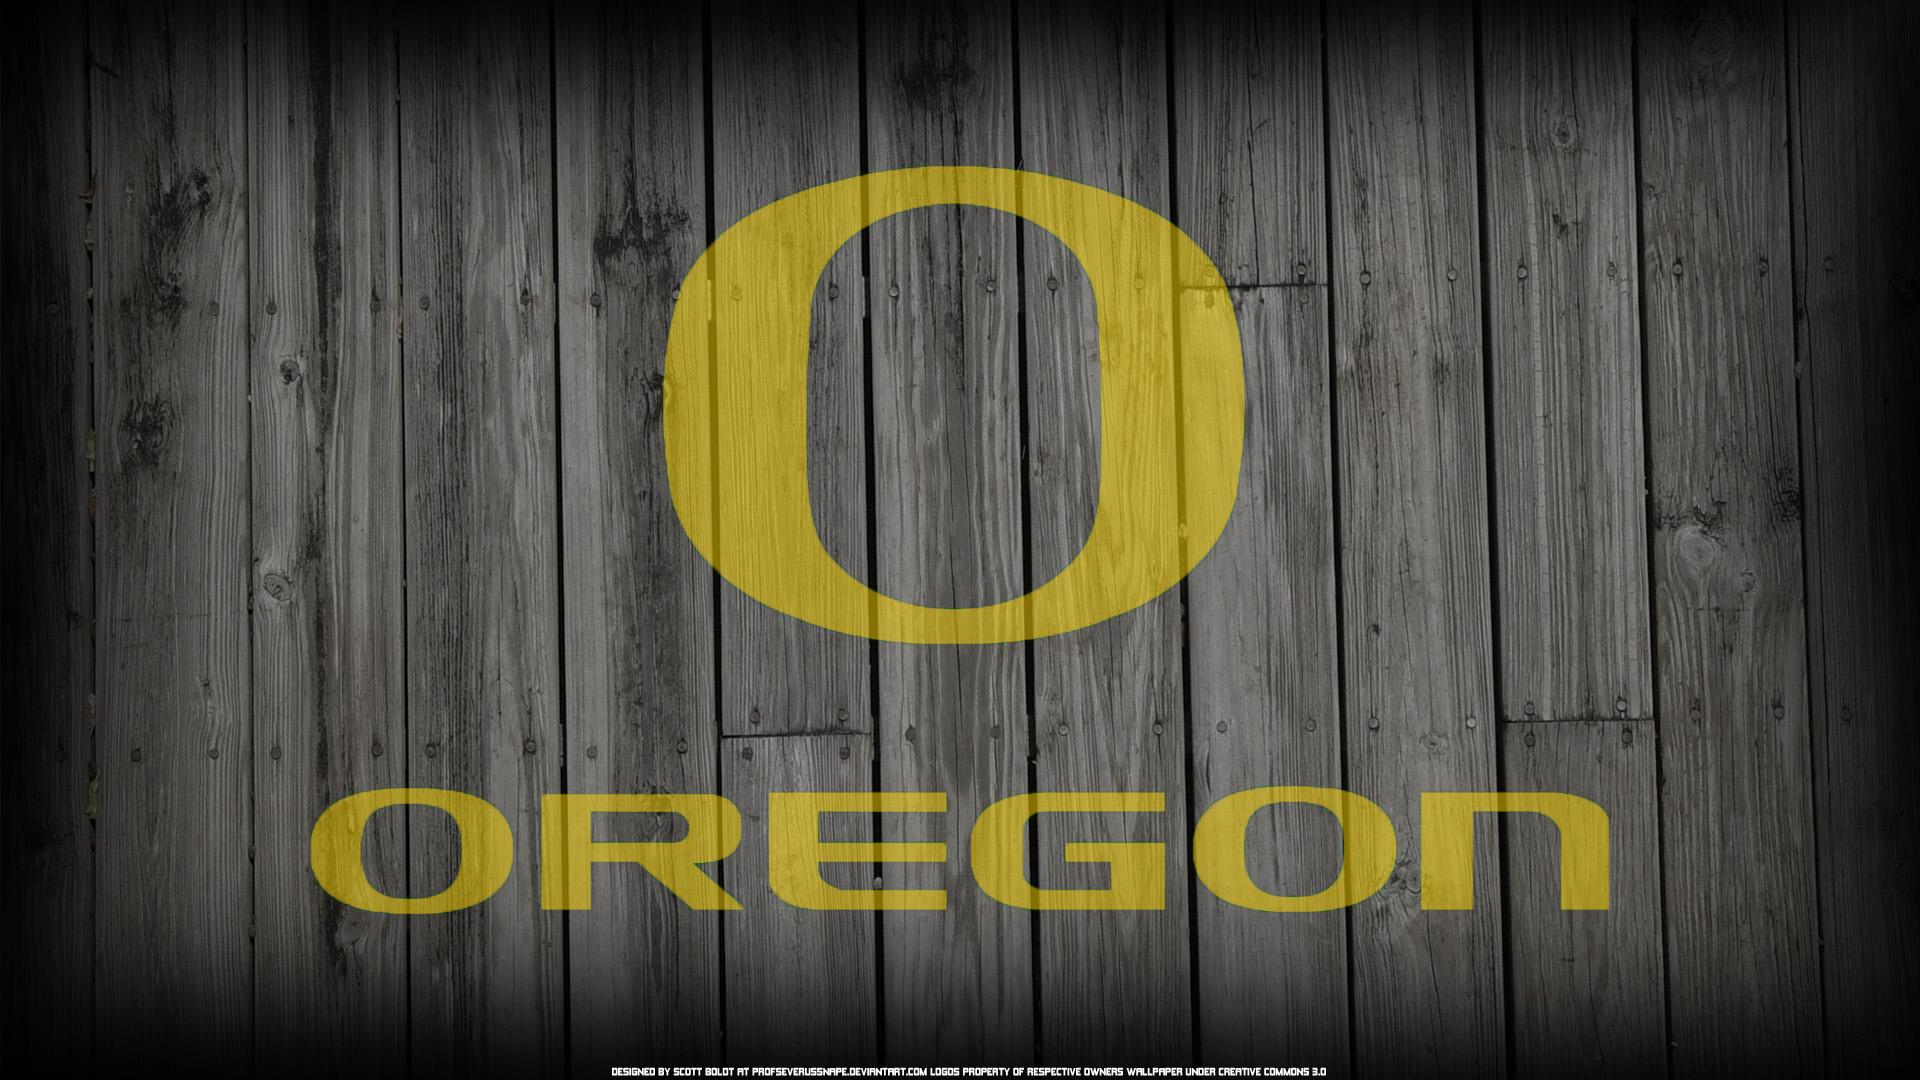 Oregon Logo on Wood Fence Background by ProfSeverusSnape 1920 x 1920x1080